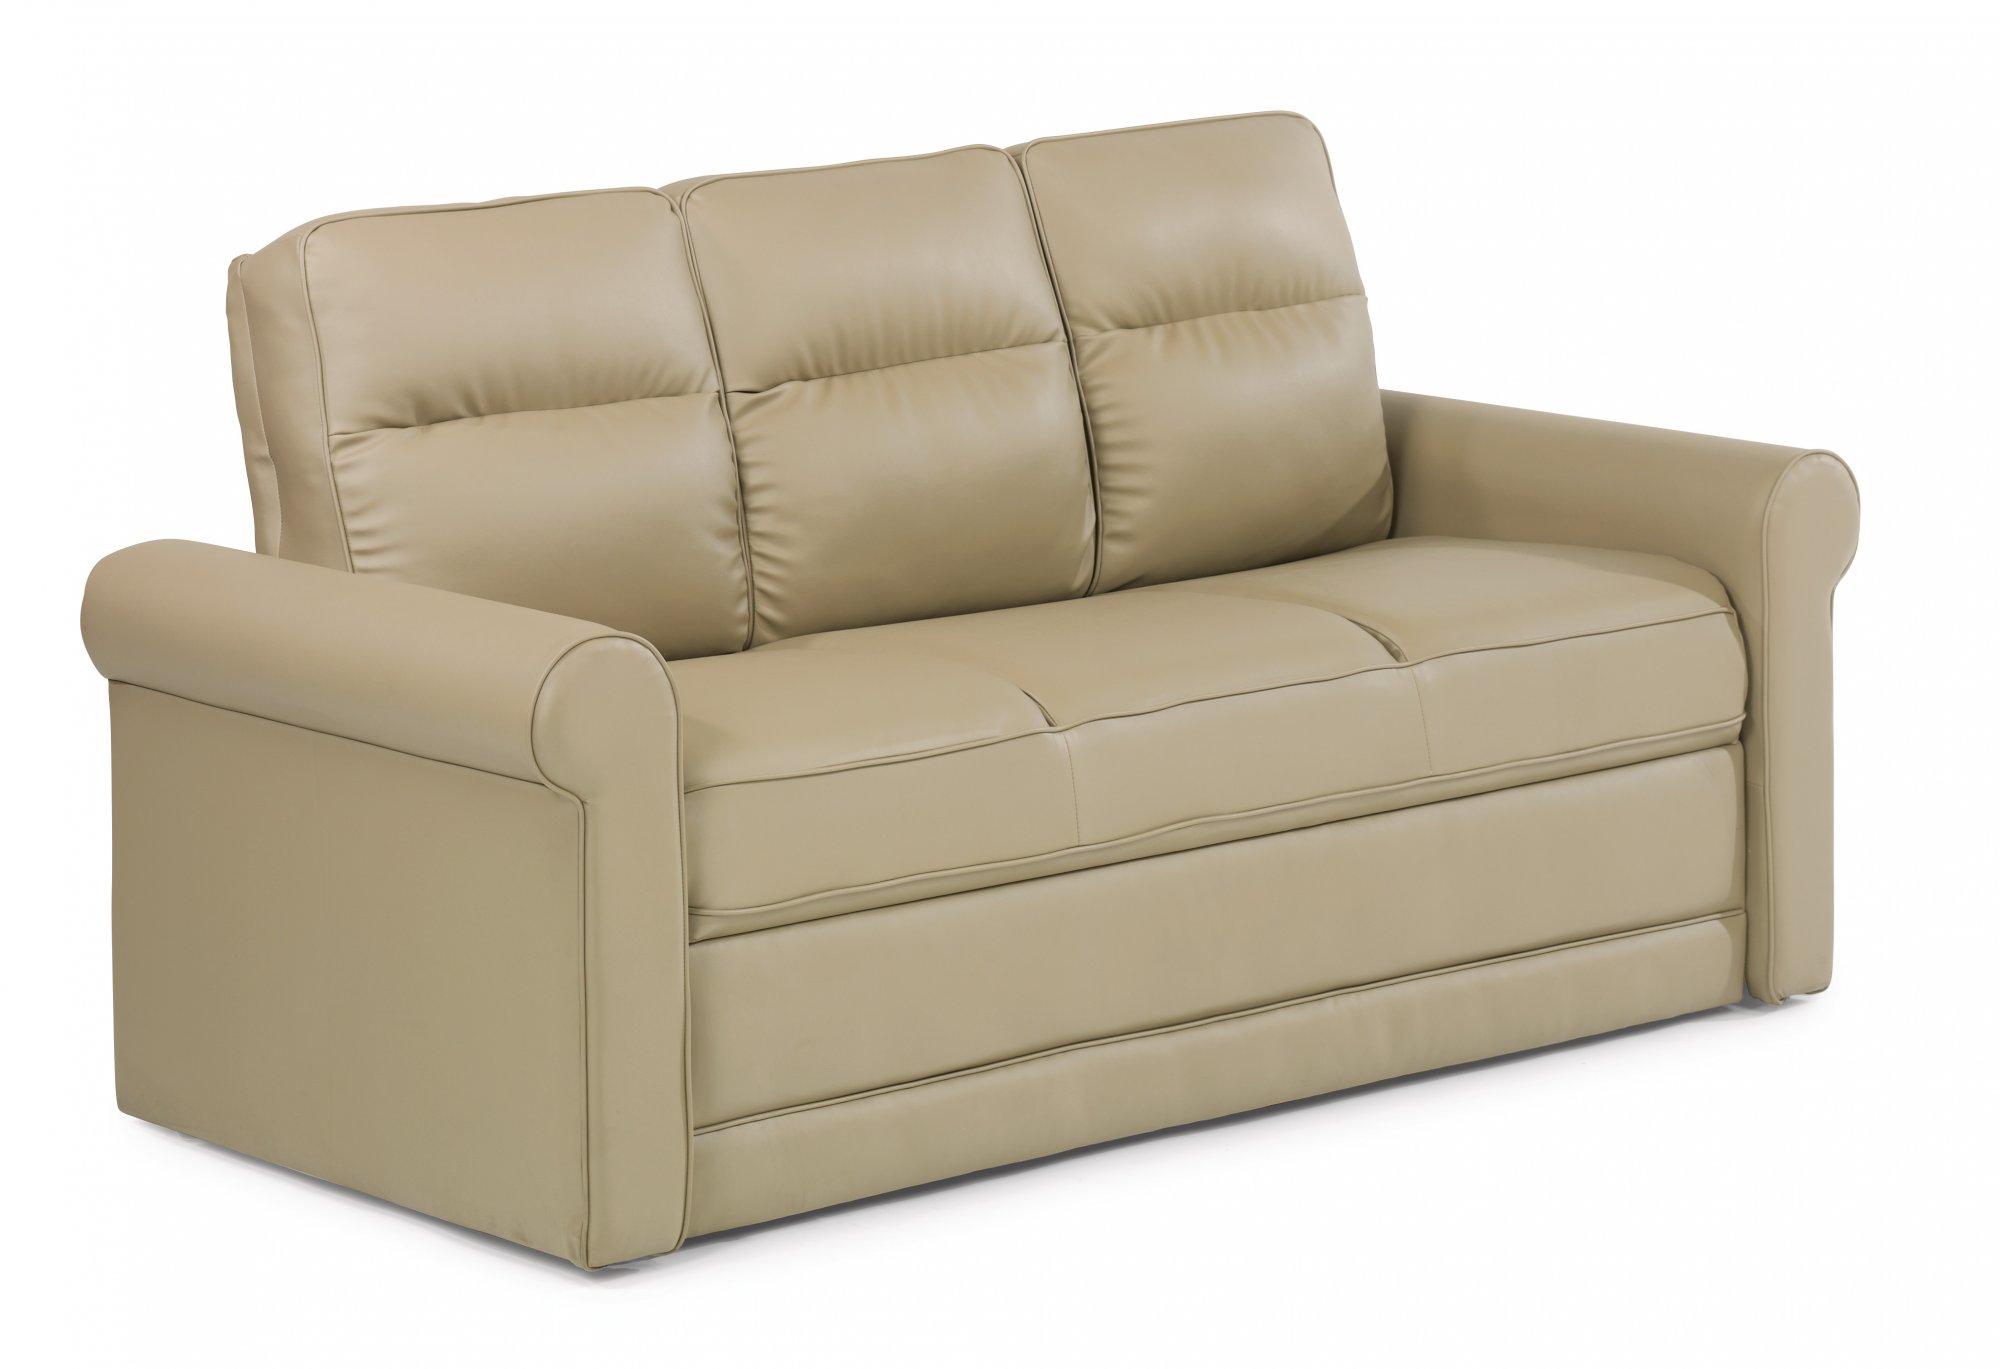 RV Sofas RV Couch